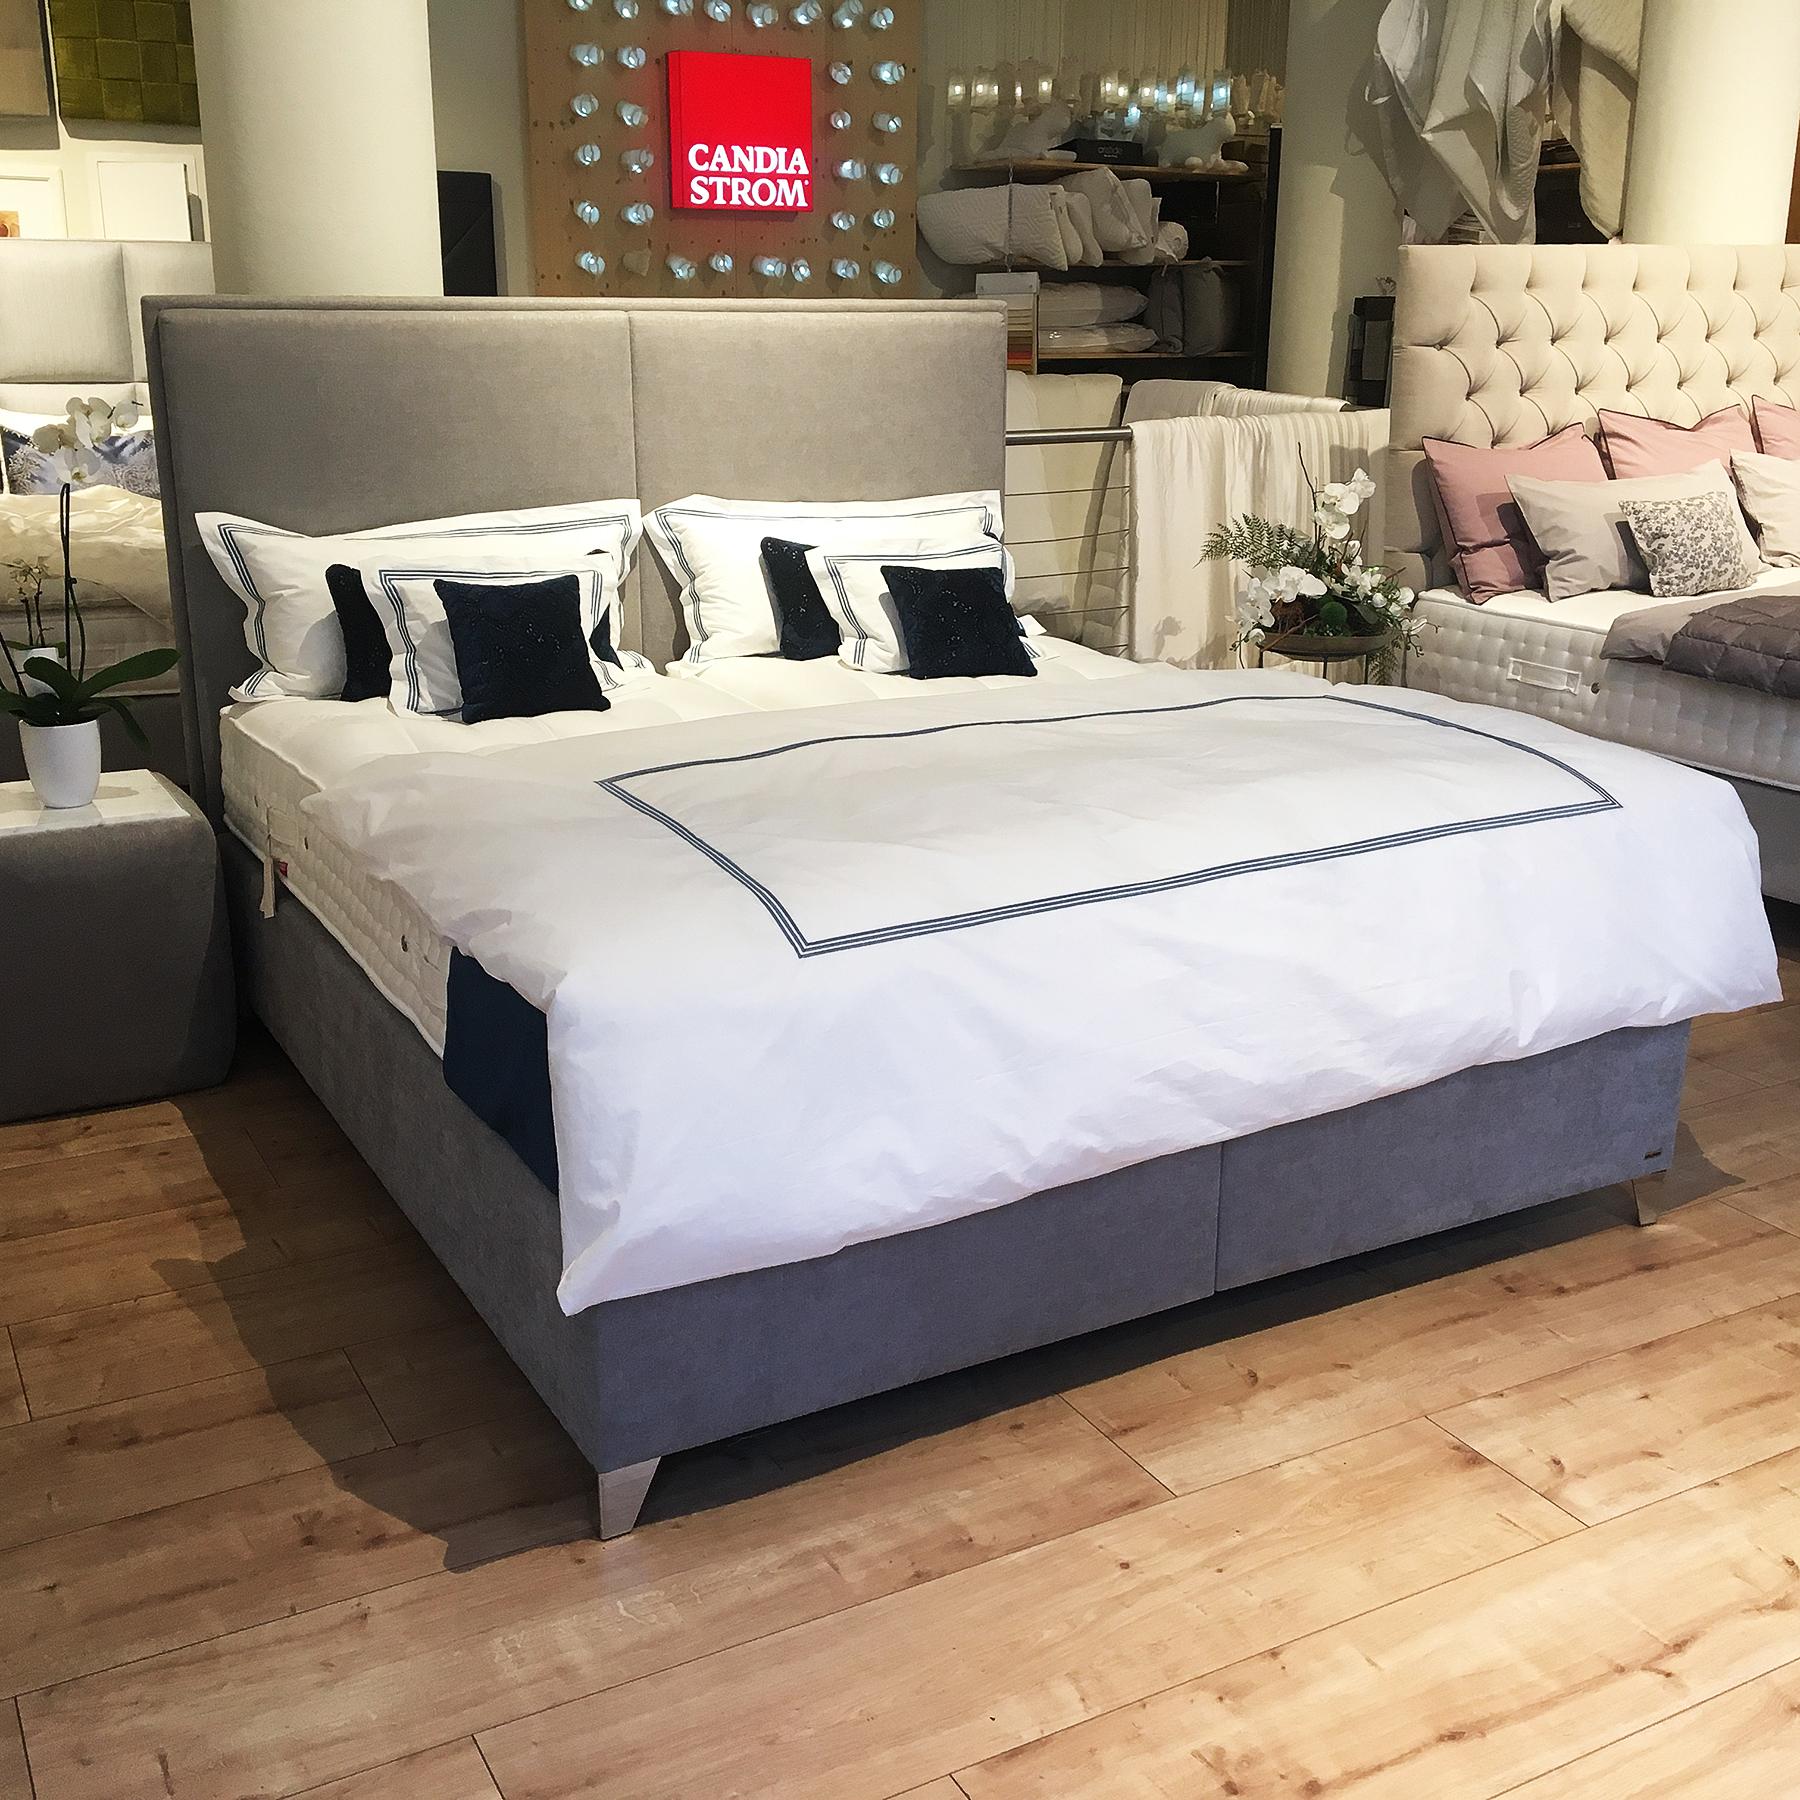 Full Size of Luxus Betten Boxspringbetten Bettwaren Ruf Preise Paradies Wohnwert Meise Innocent Bei Ikea De Test Rauch 140x200 Outlet 100x200 Gebrauchte Günstige 180x200 Bett Luxus Betten